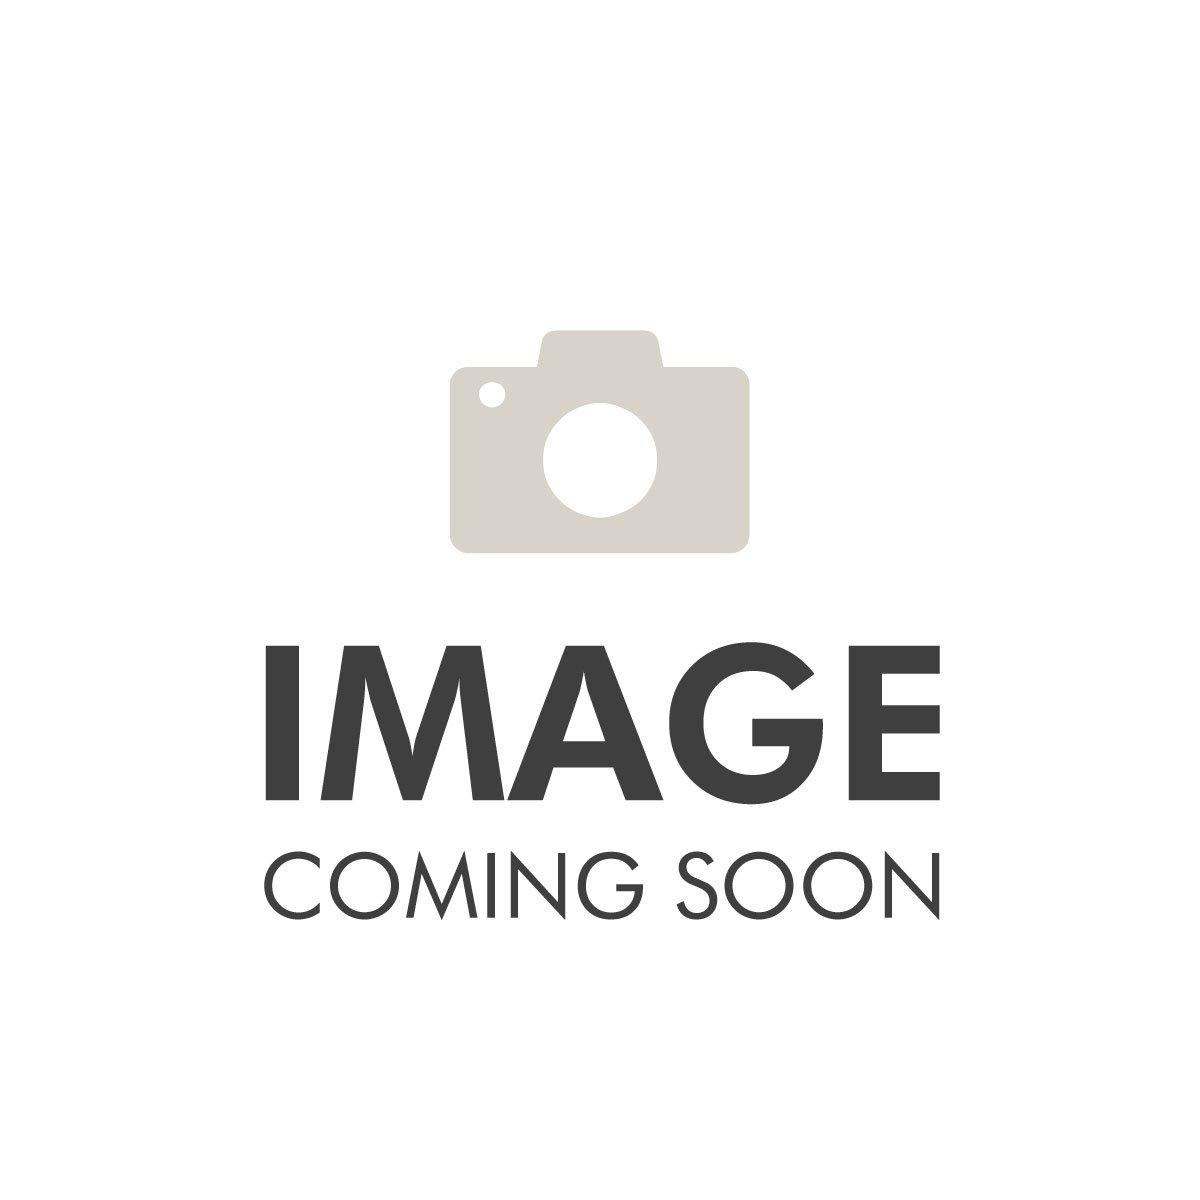 Ralph Lauren Romance 30ml EDP Spray